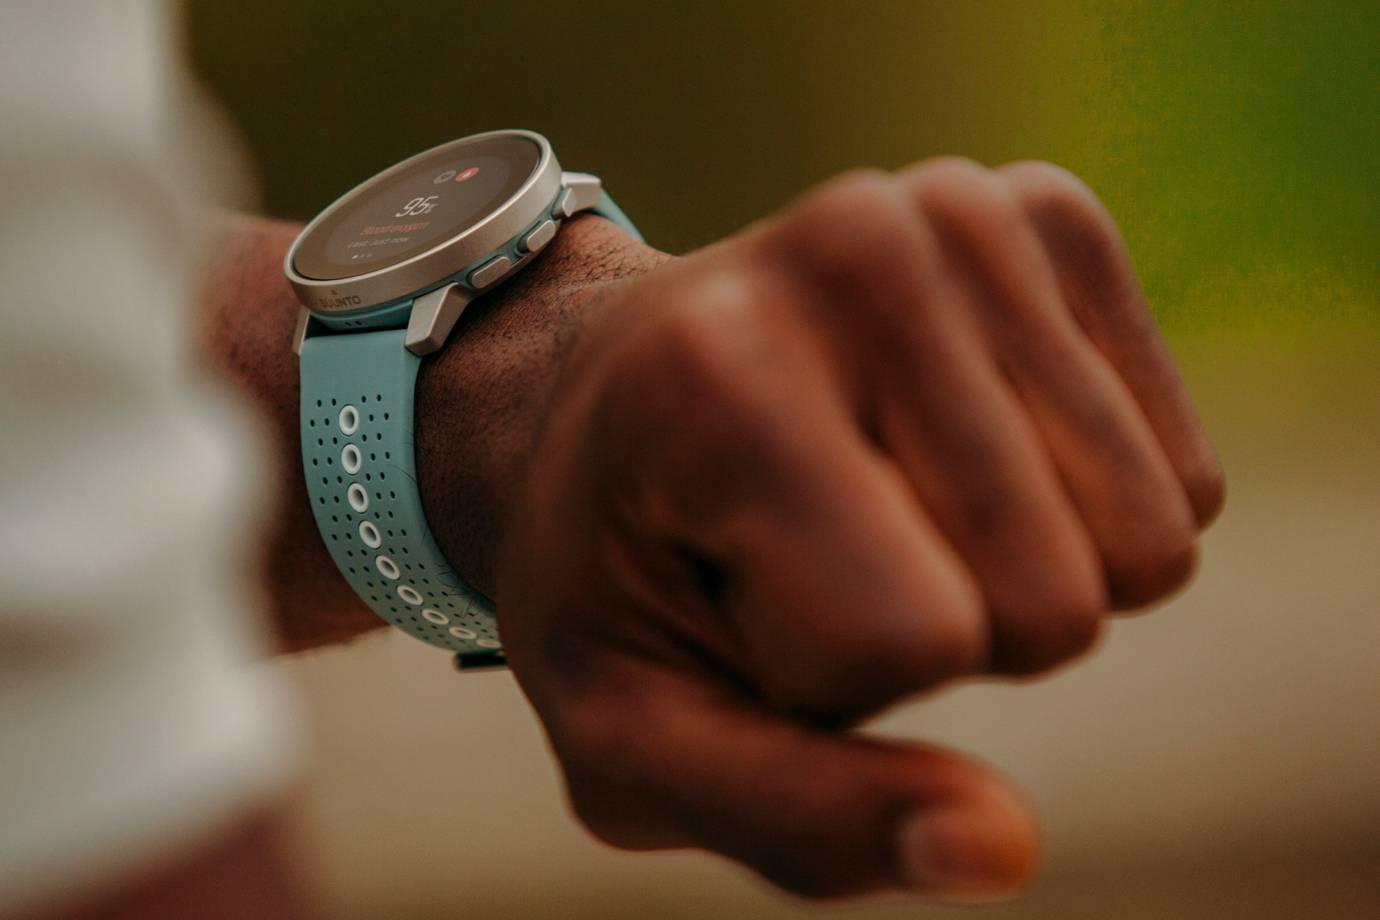 suunto 9 peak fitness watch